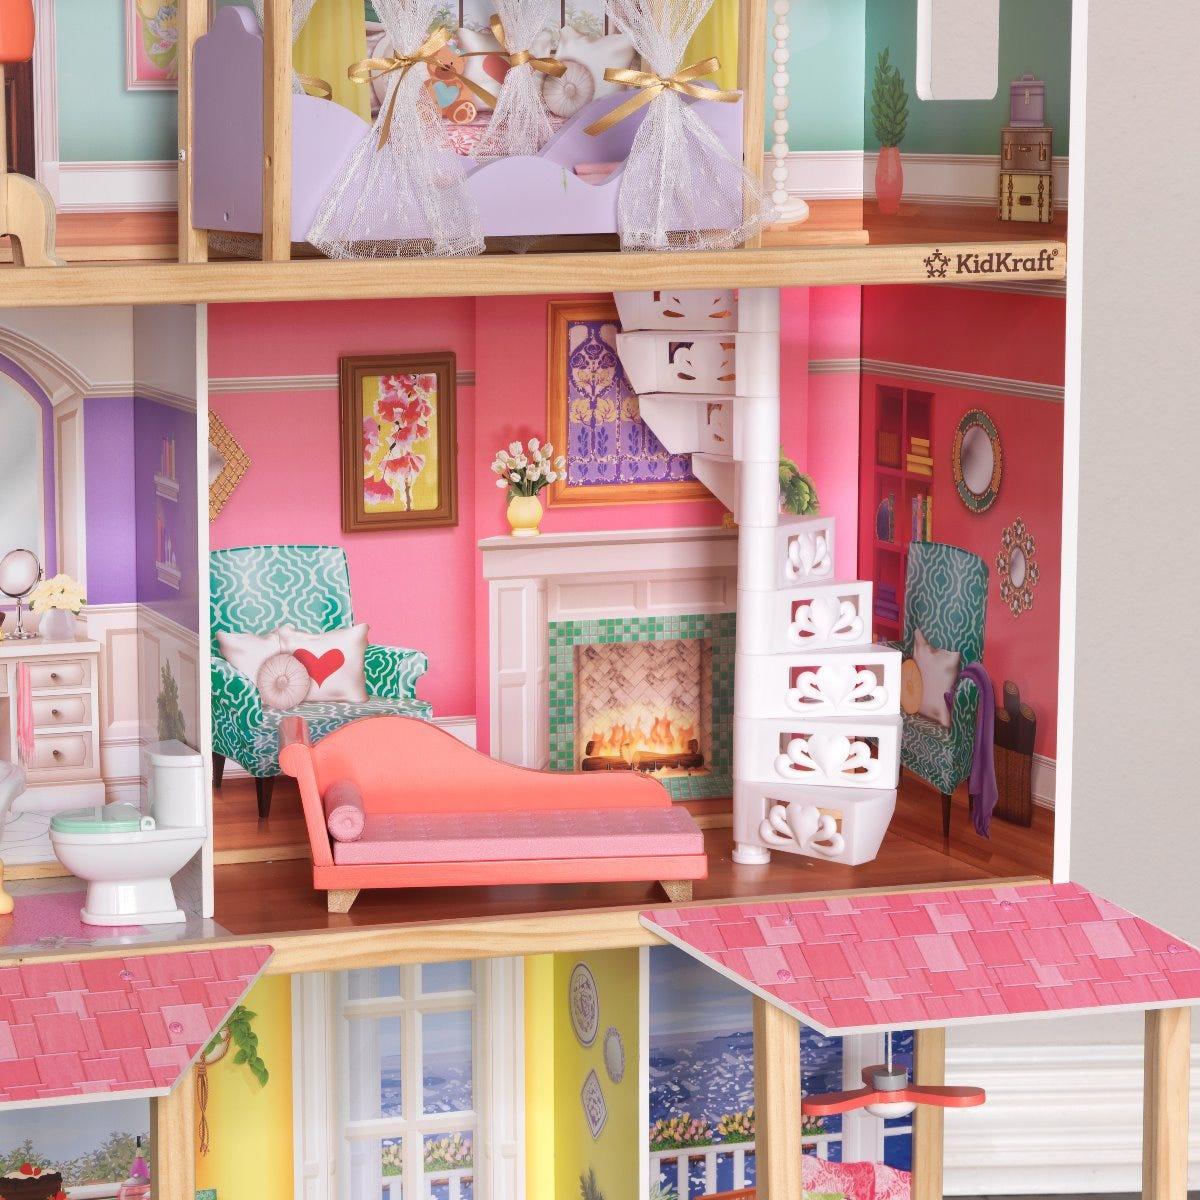 Kidkraft къща за кукли Барби - Вивиан-bellamiestore